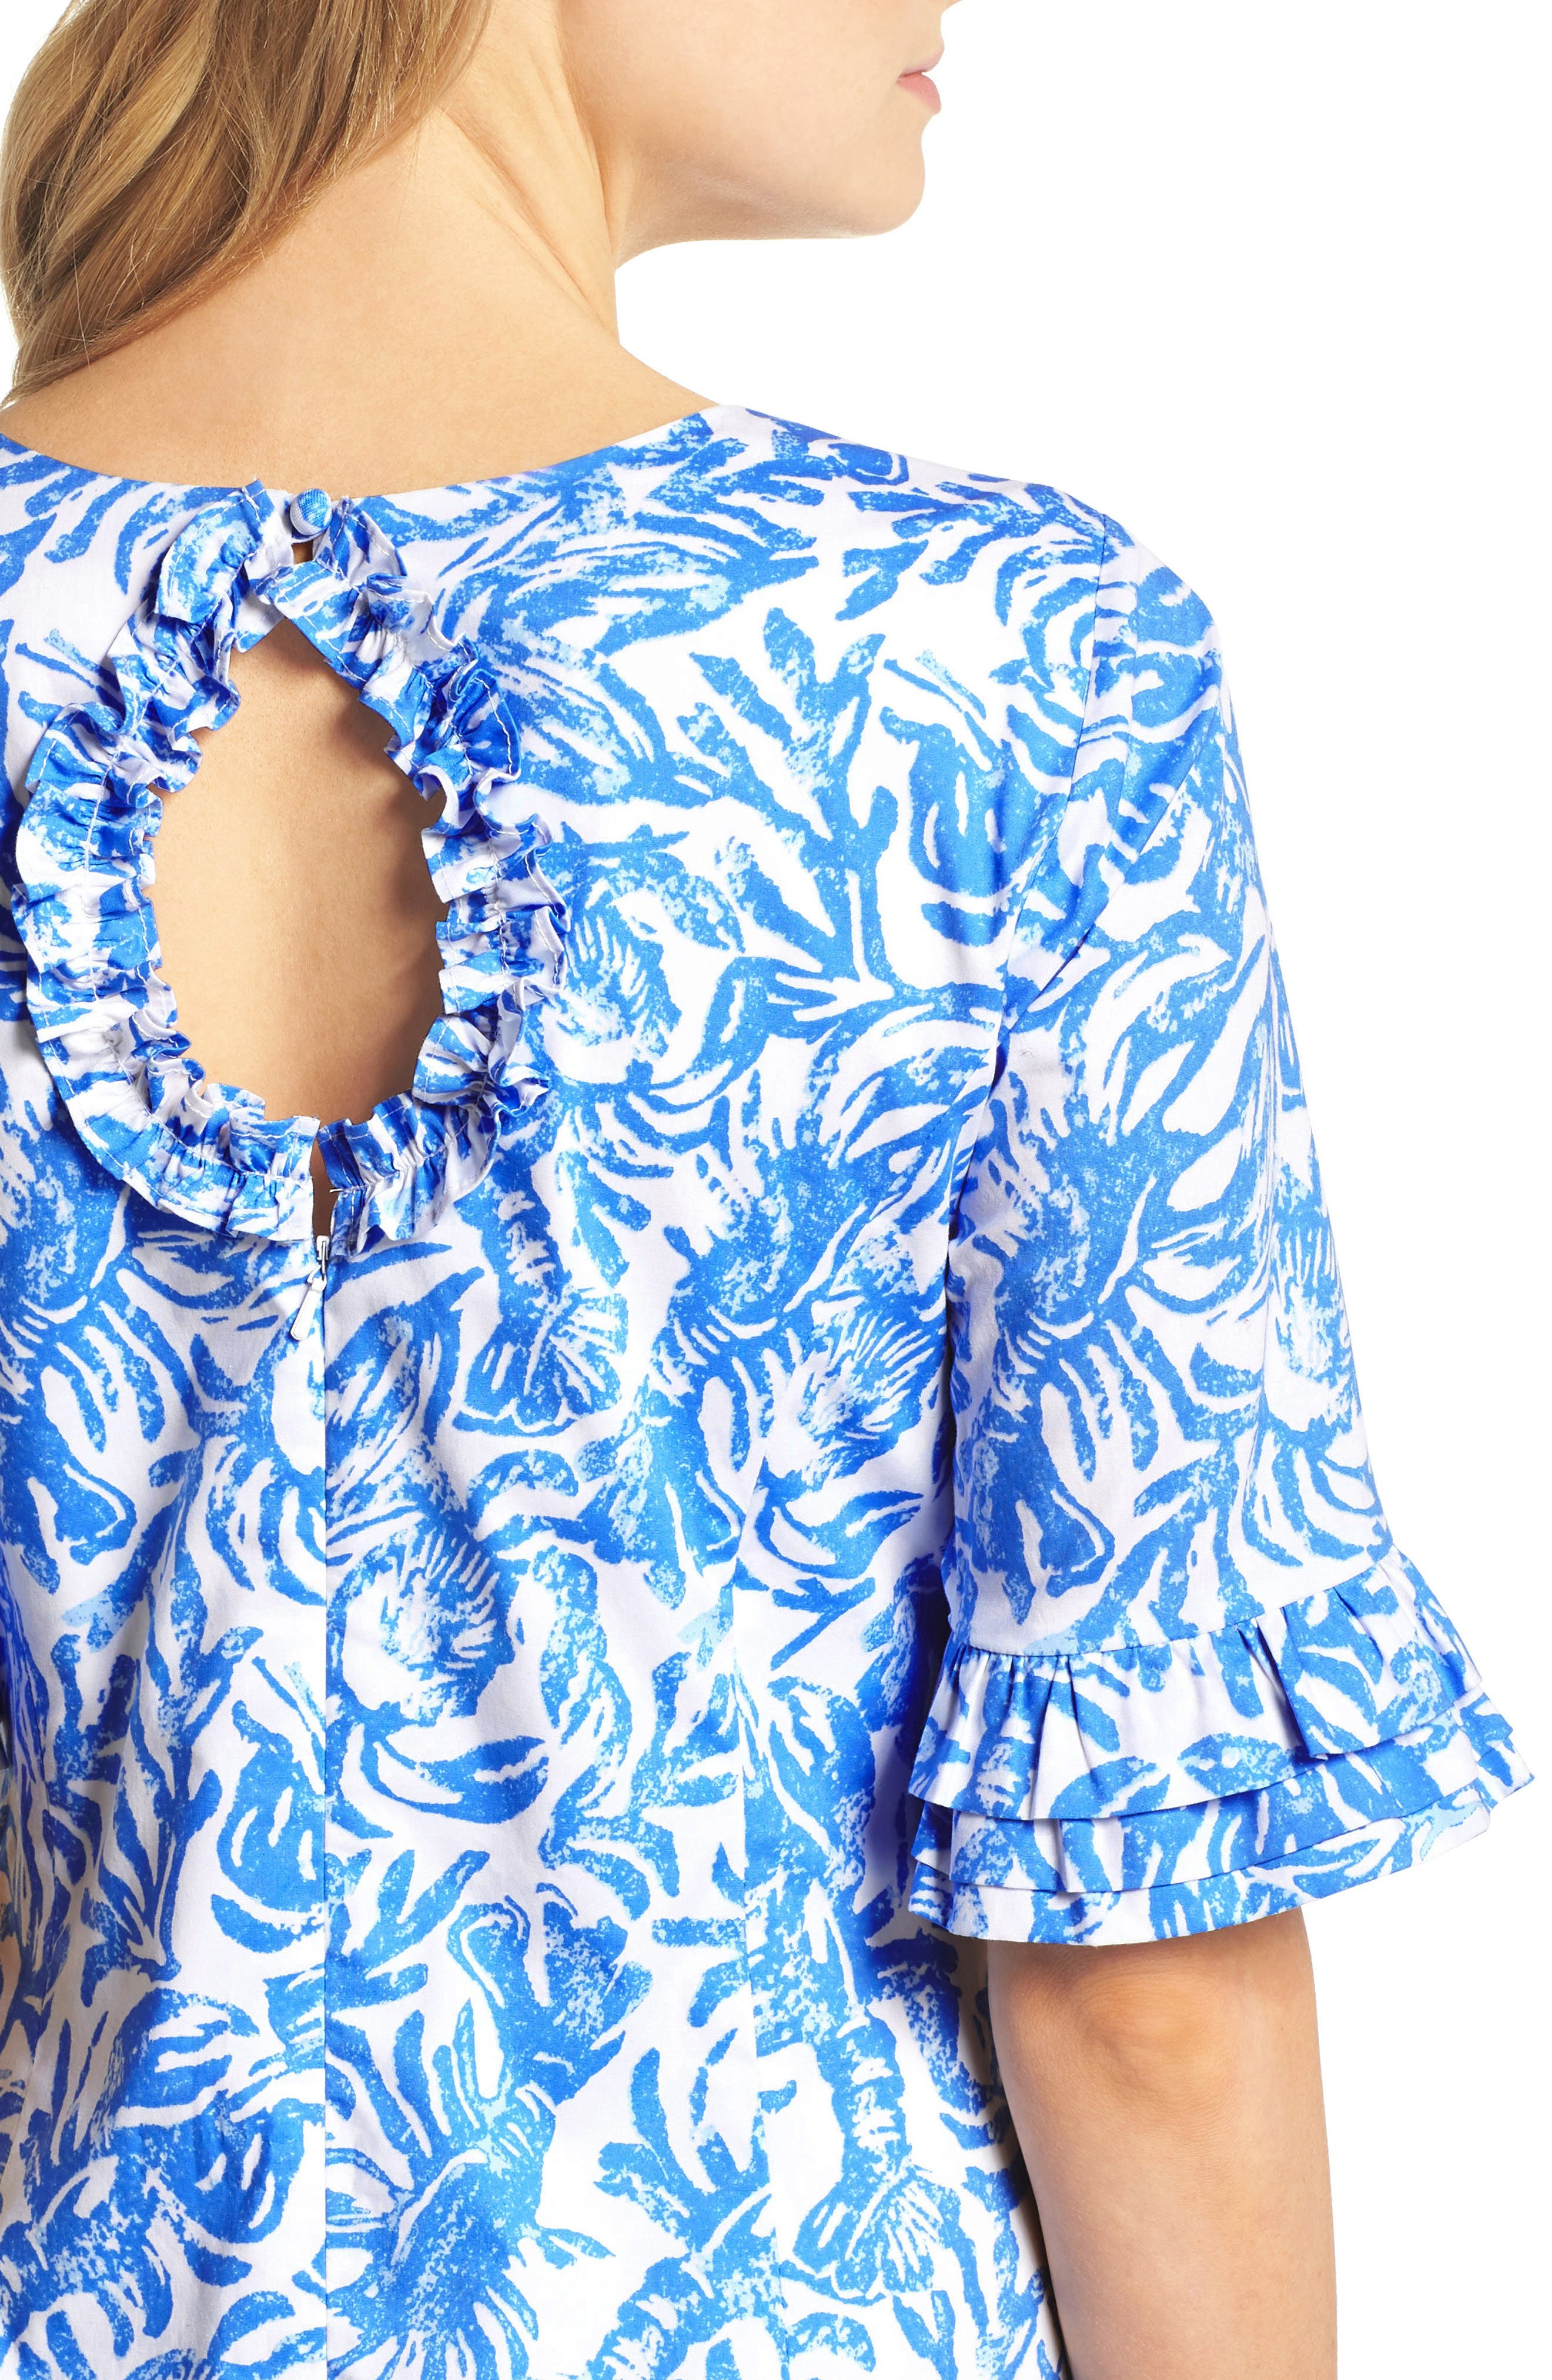 Fiesta Stretch Sheath Dress,                             Alternate thumbnail 4, color,                             Resort White On A Roll